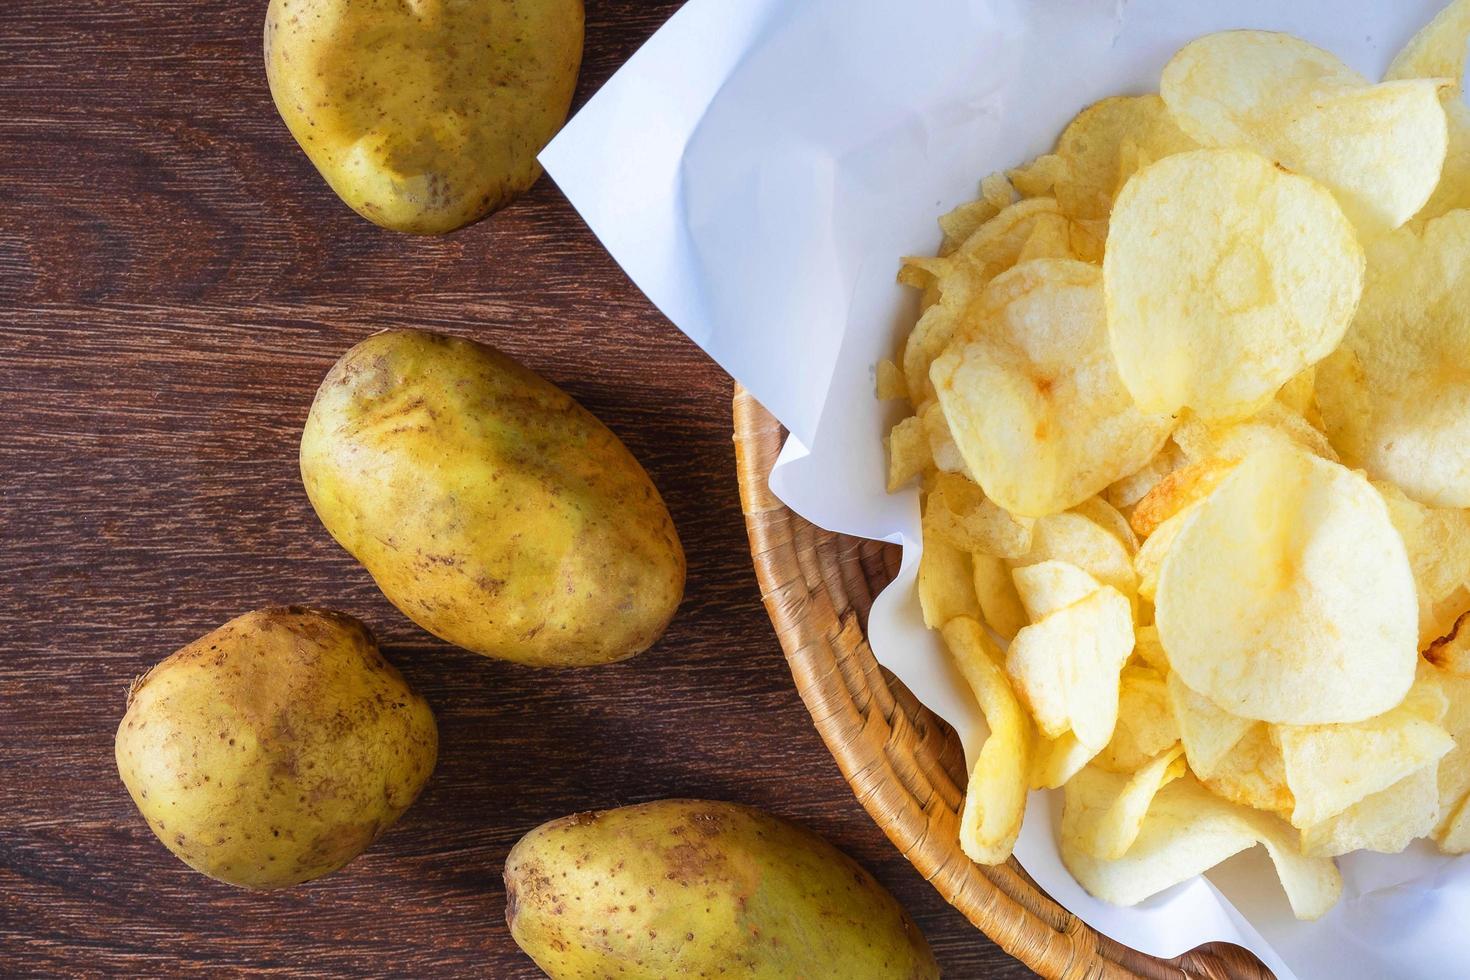 gebakken aardappelchips in mand foto